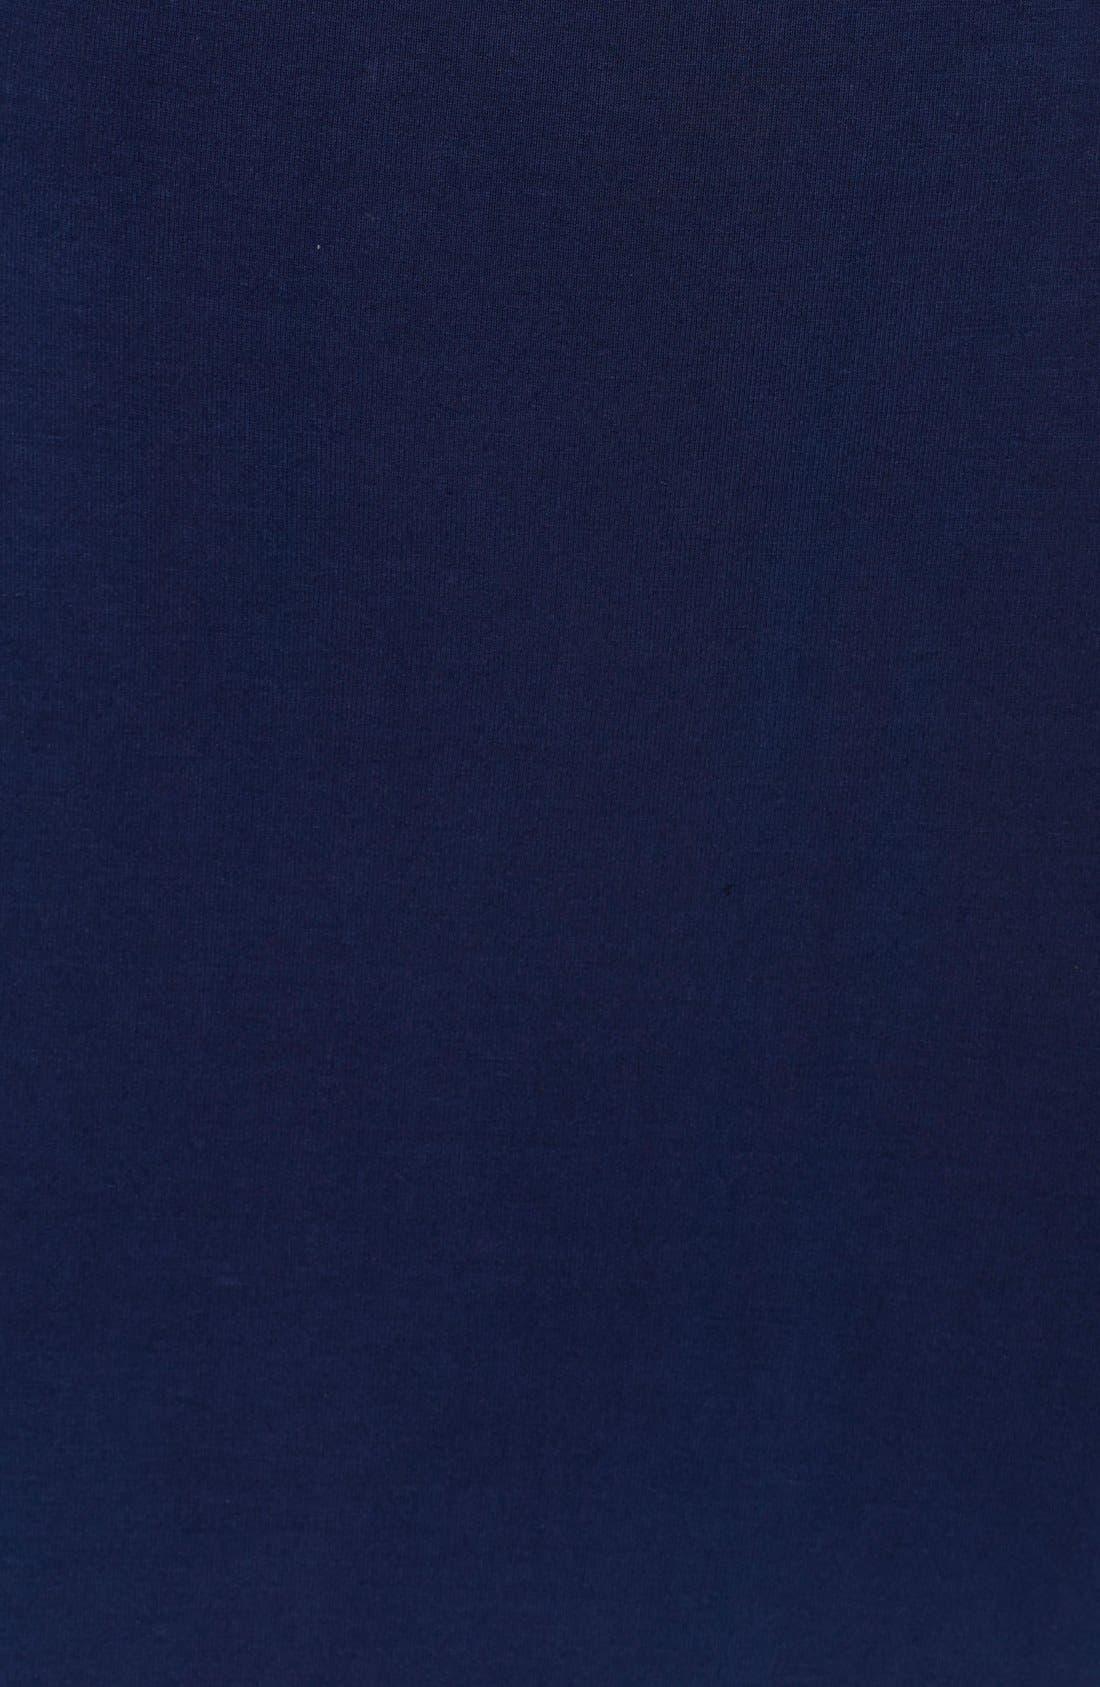 Racerback Maxi Dress,                             Alternate thumbnail 7, color,                             400